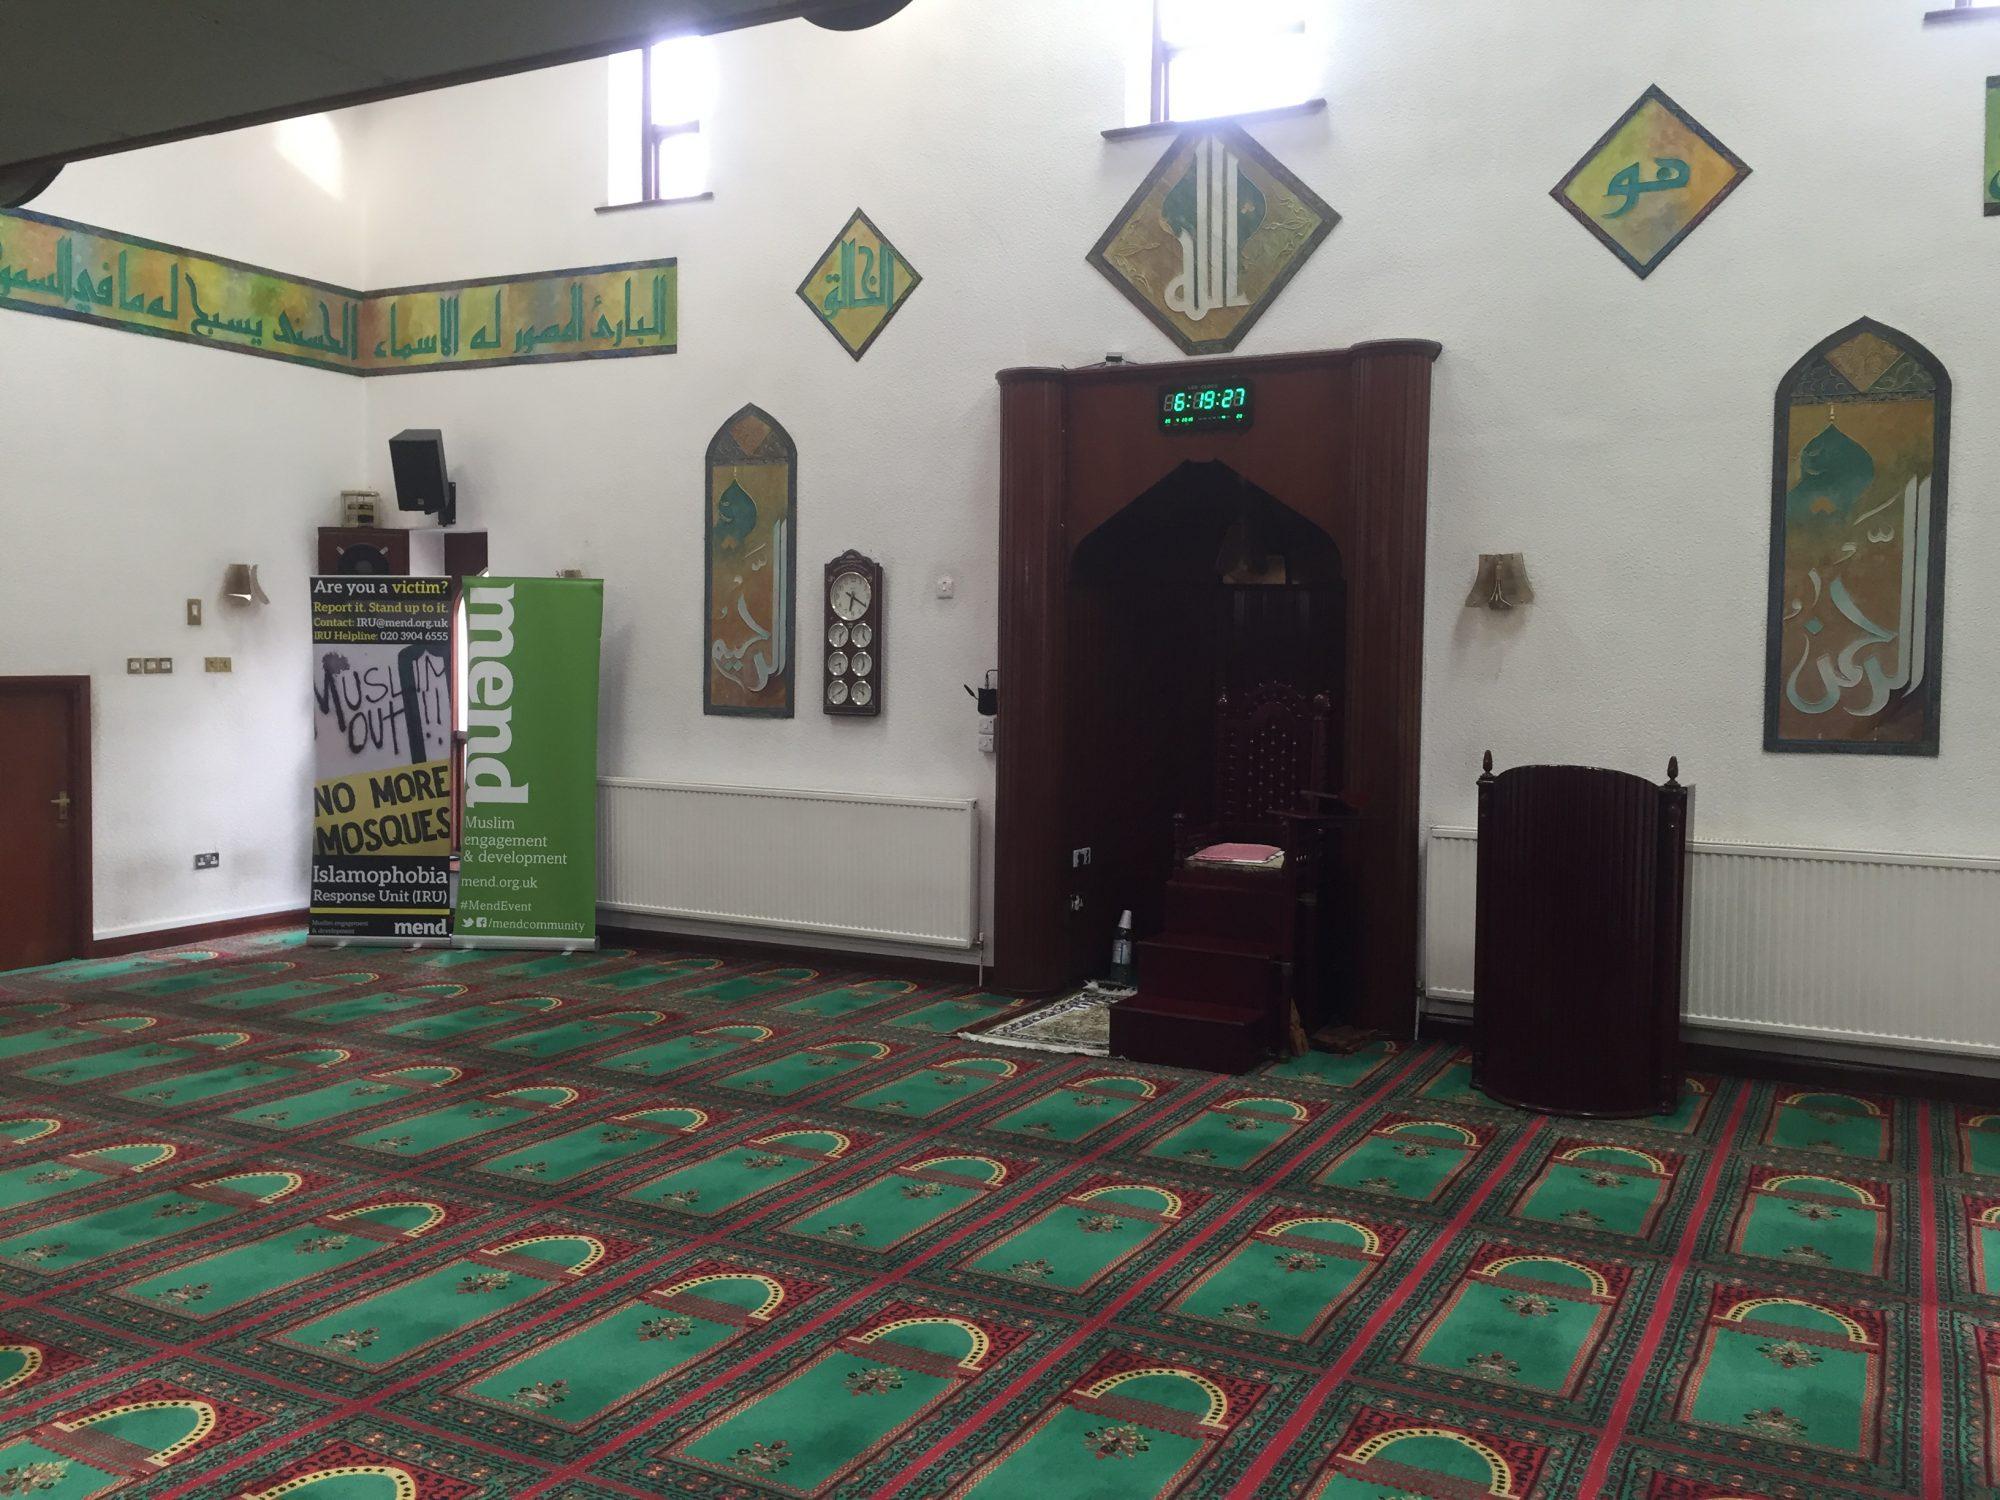 Aisha Mosque & Islamic Centre – Walsall